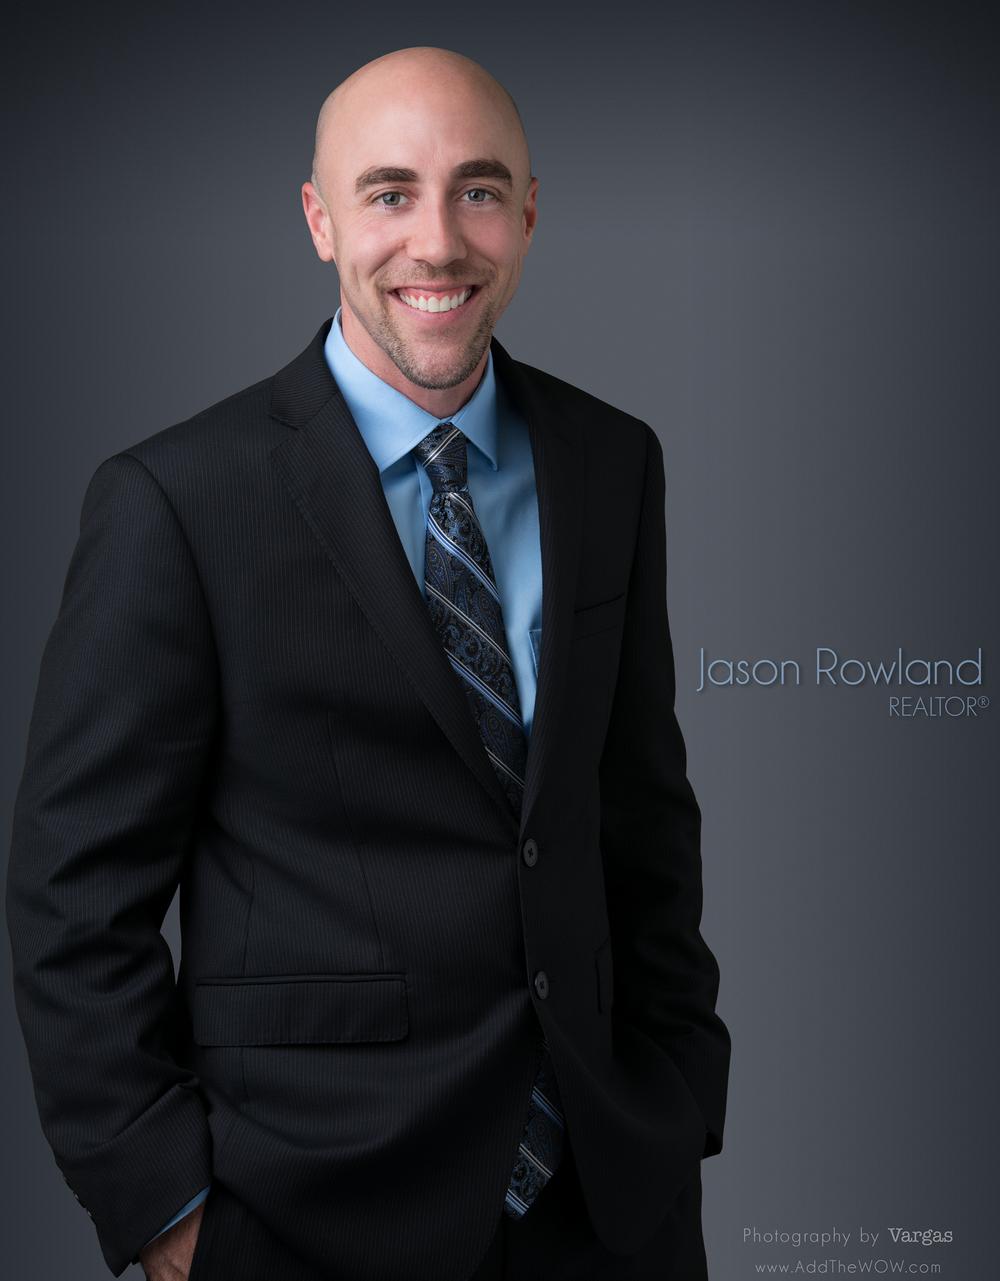 Jason-Rowland-Realtor-Headshot-Vargas-C21.png